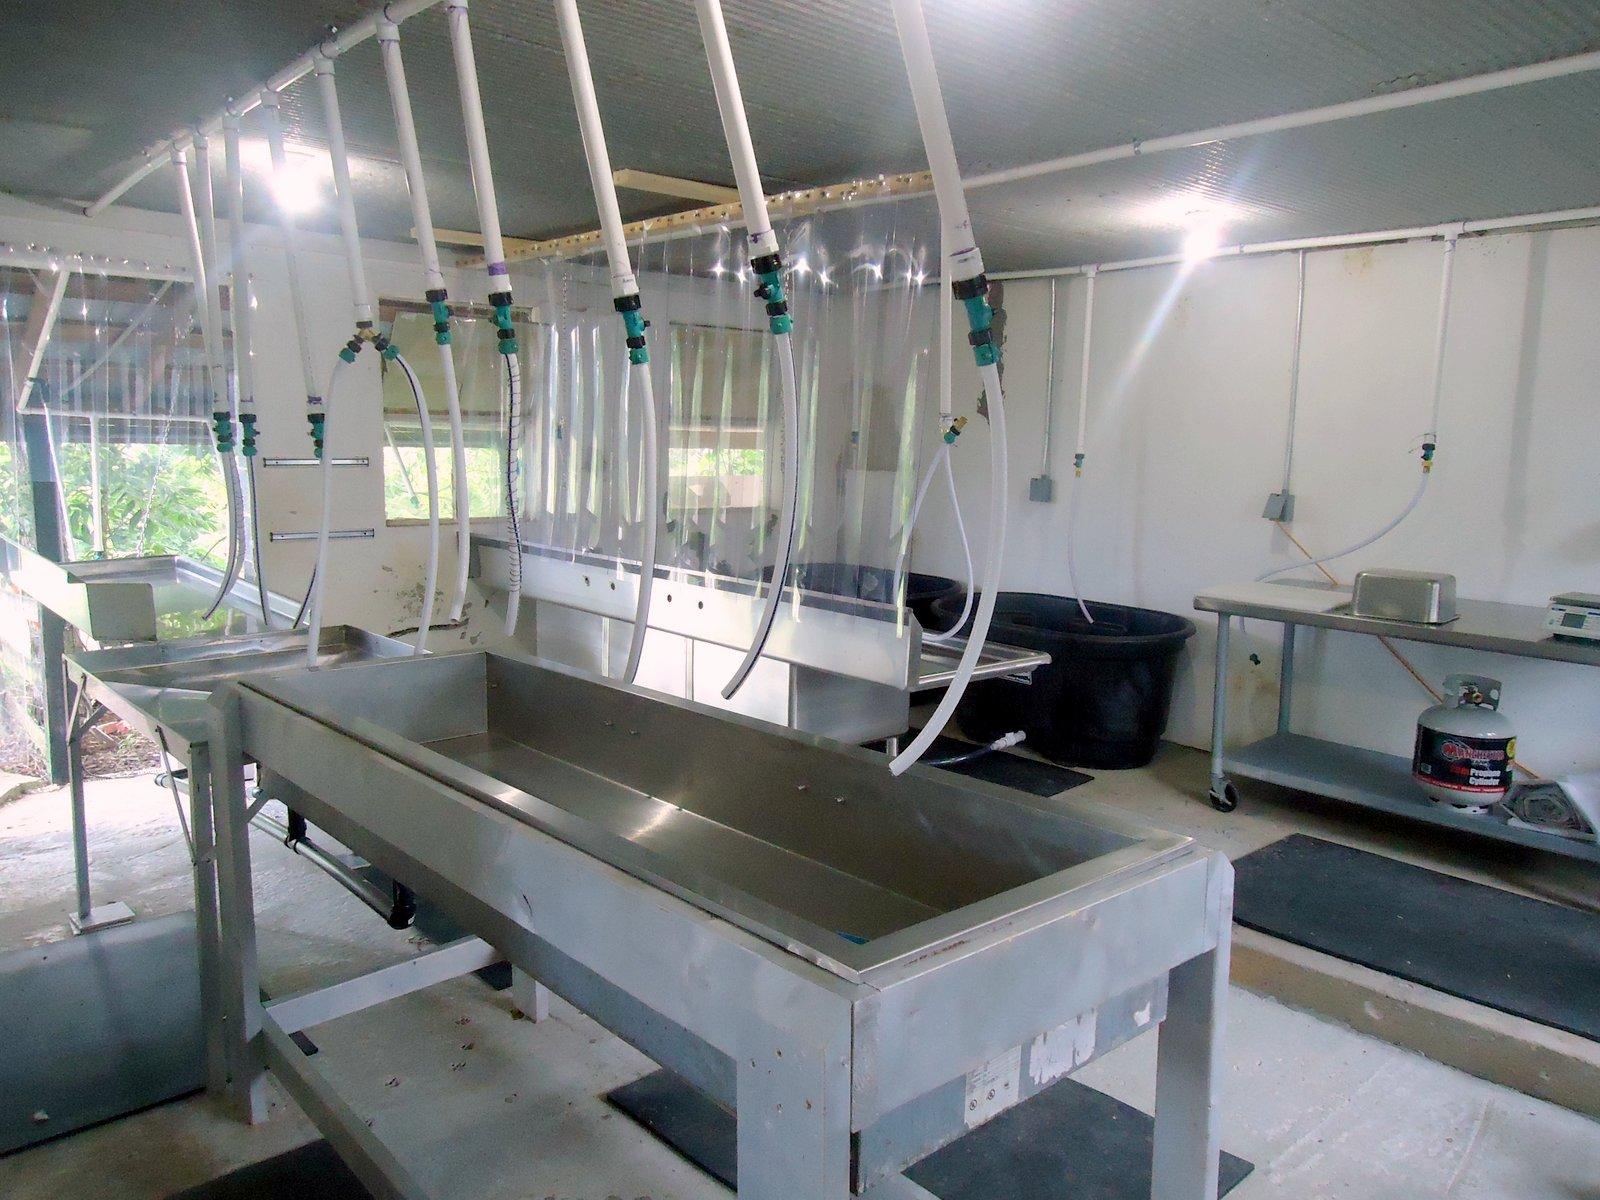 Eco-Friendly Small Scale Slaughterhouse : DQ Farm (est. 1991) |Chicken Slaughterhouse Design